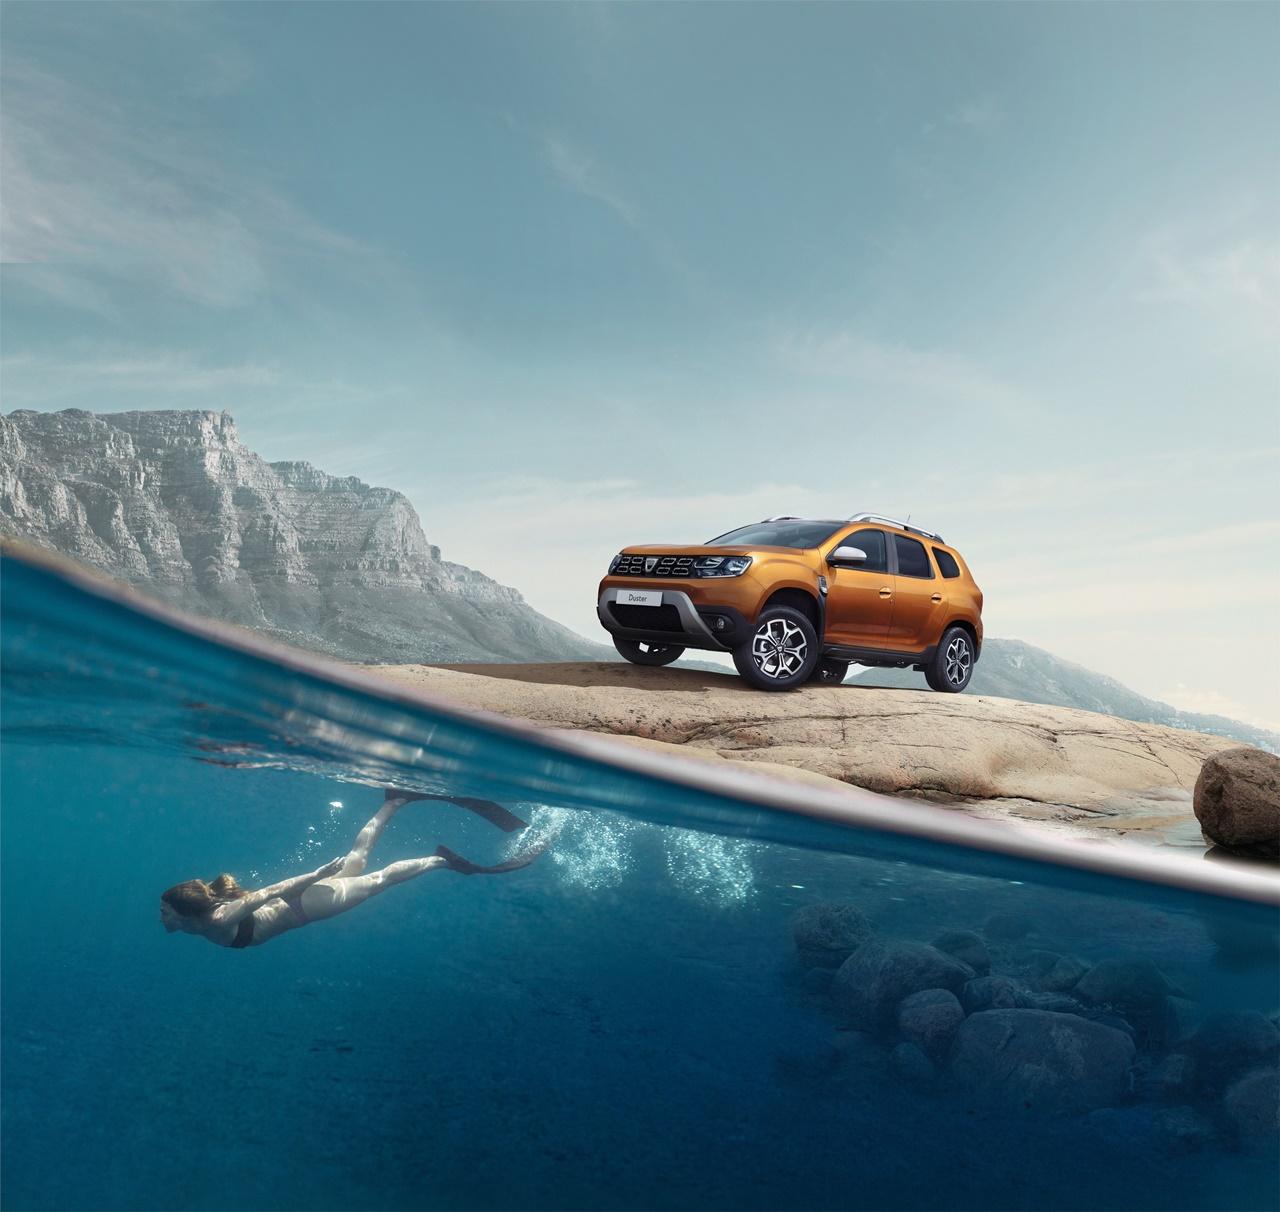 Dacia Duster Cennik 2018 >> Nowa Dacia Duster 2018 [aktualizacja - cennik] - Test Auto